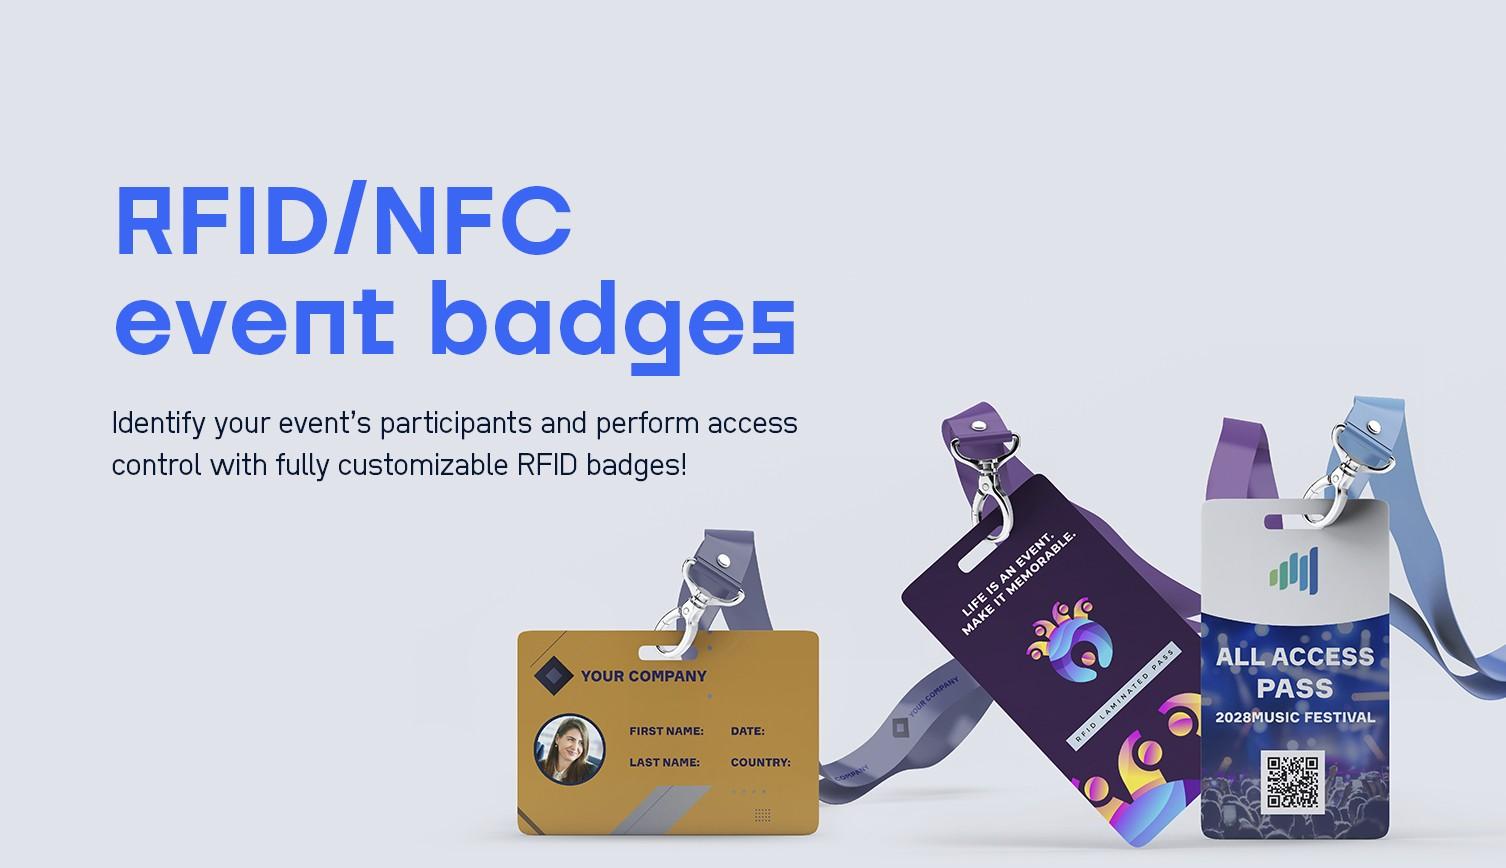 RFID / NFC event badges